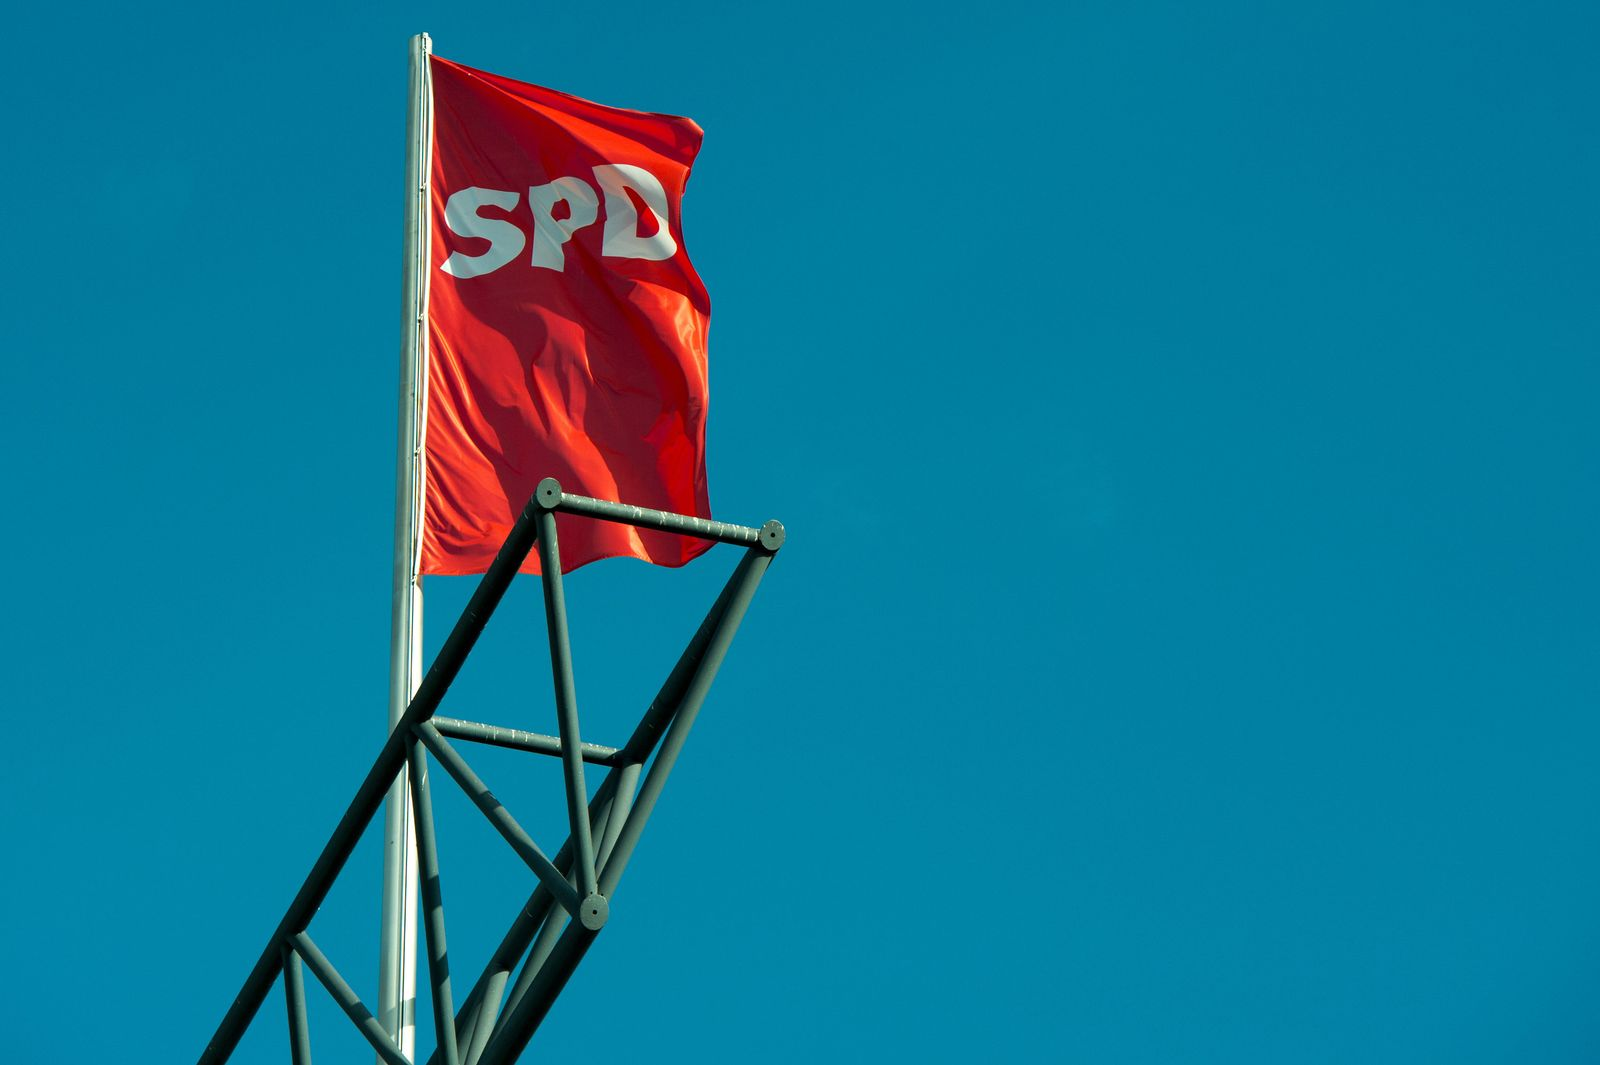 SPD-Fahne